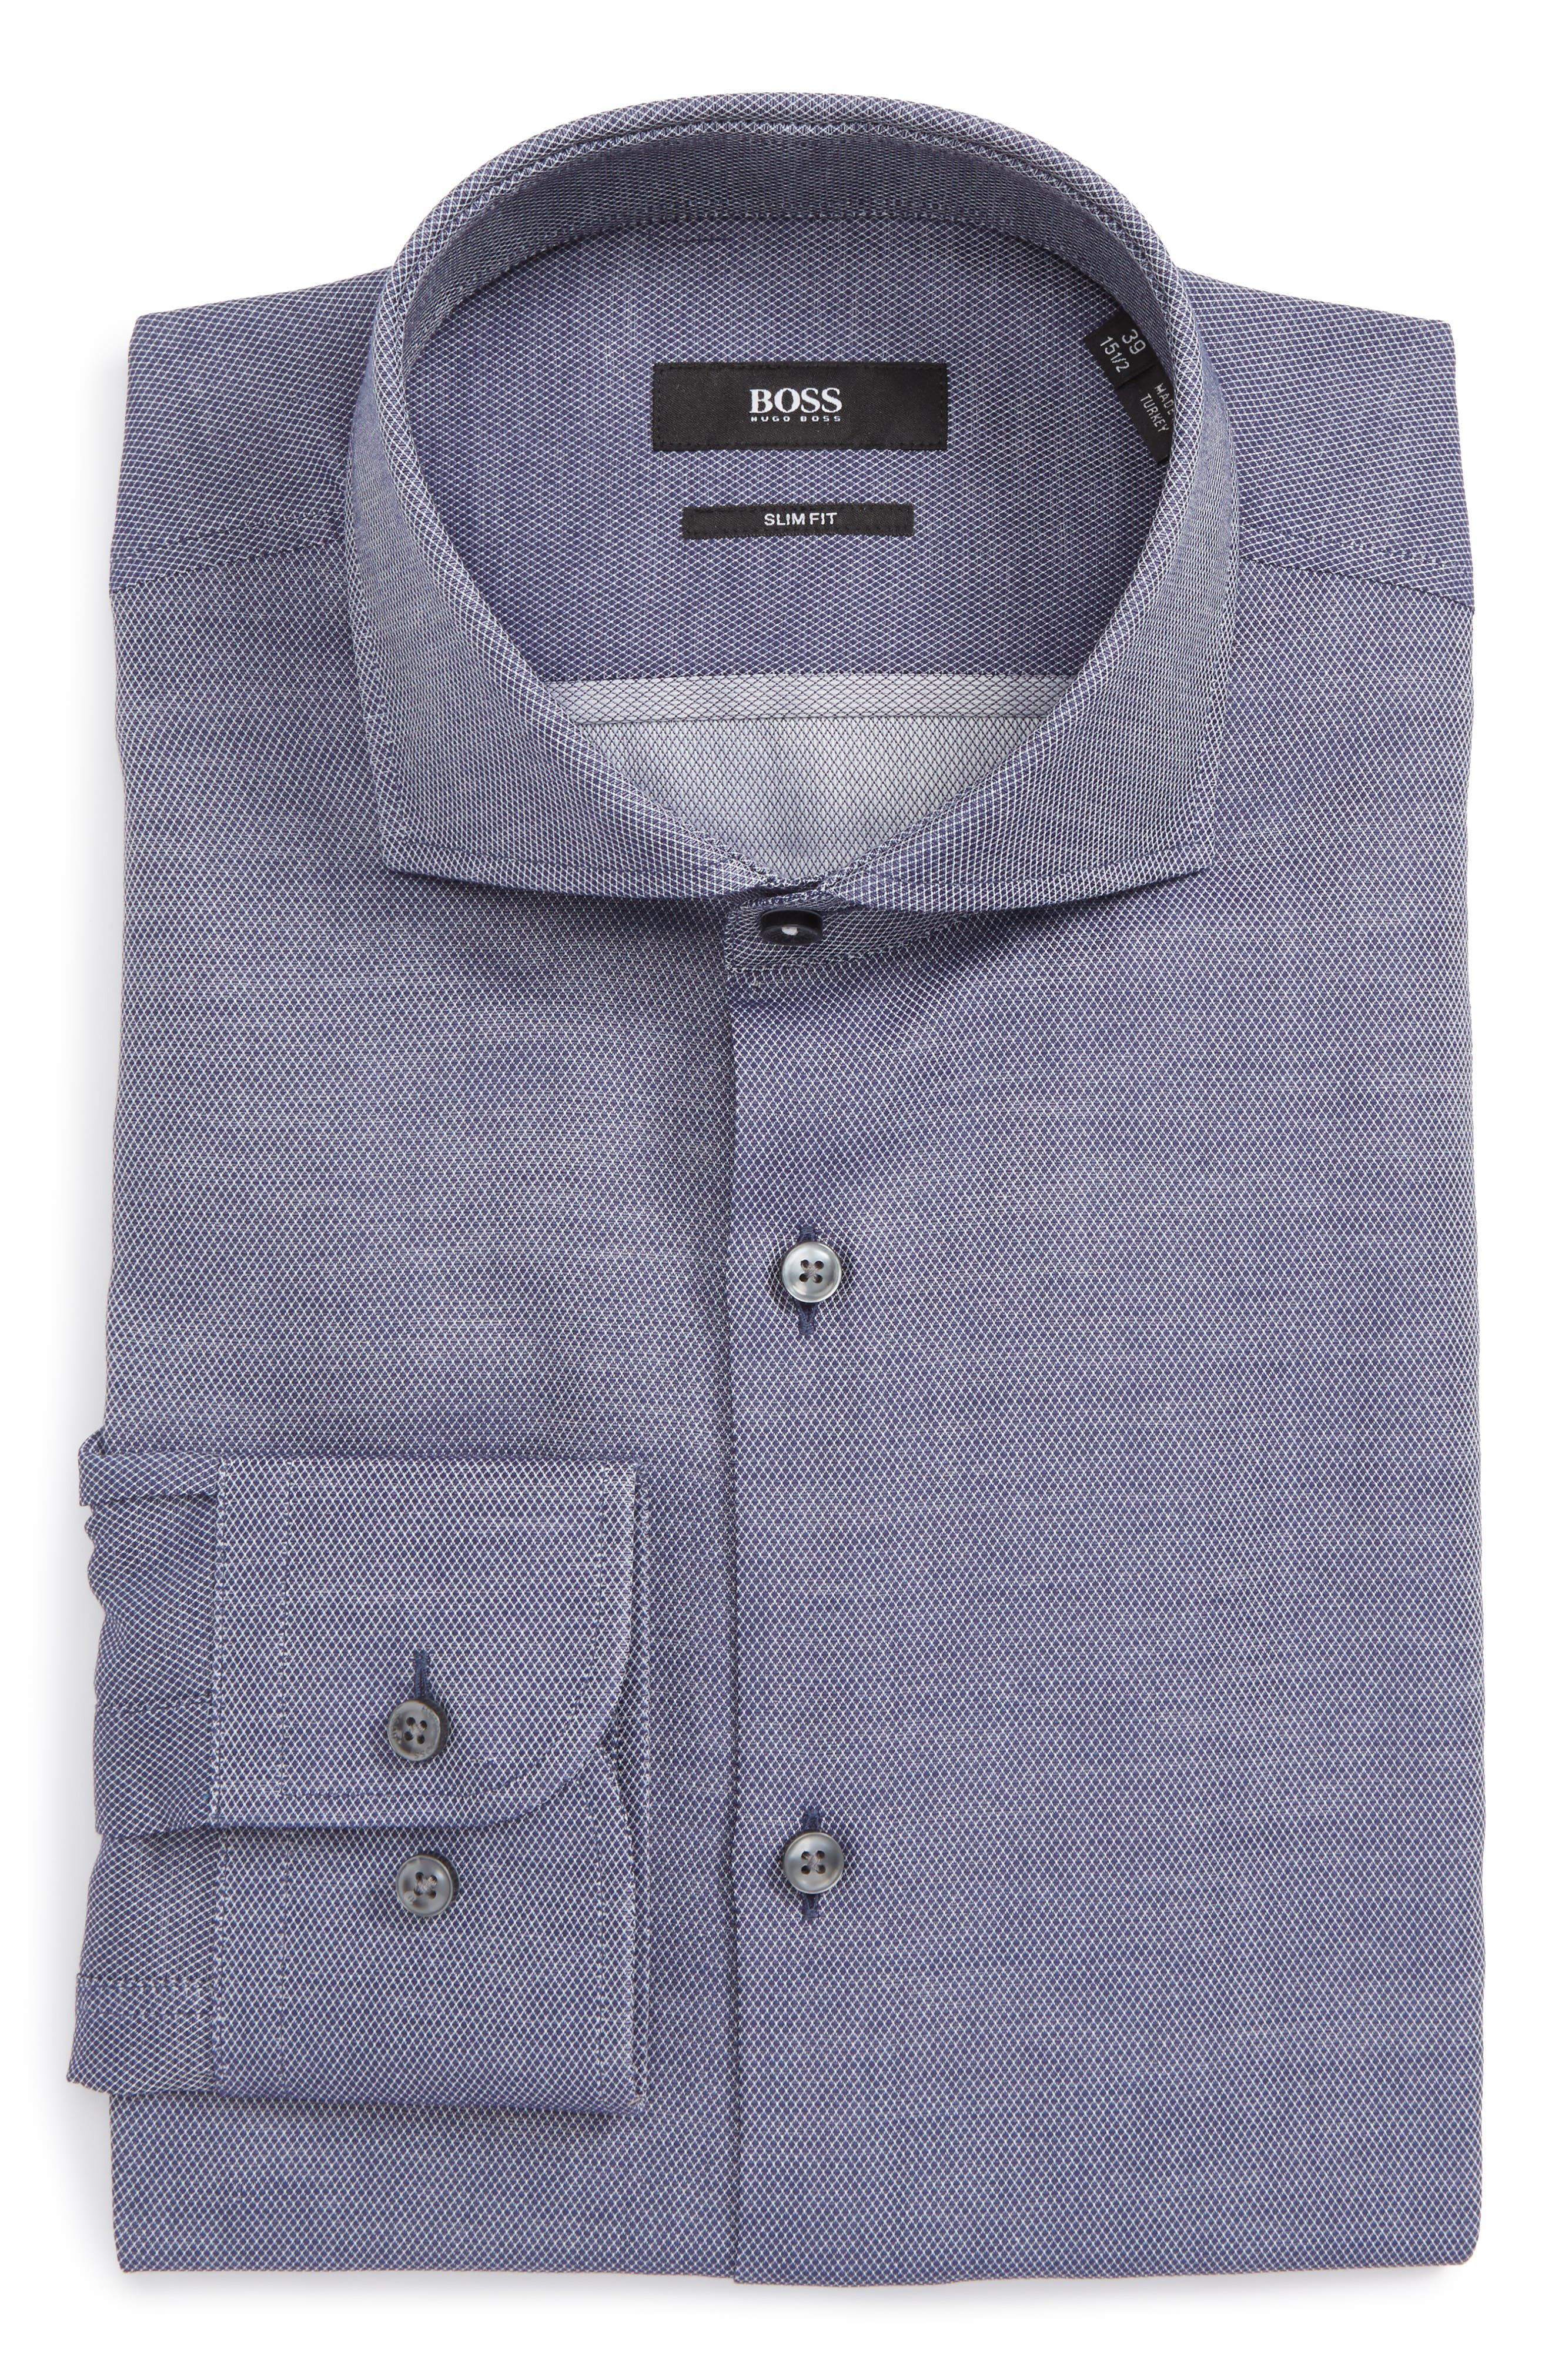 Jerrin Slim Fit Diamond Dress Shirt,                         Main,                         color, Navy